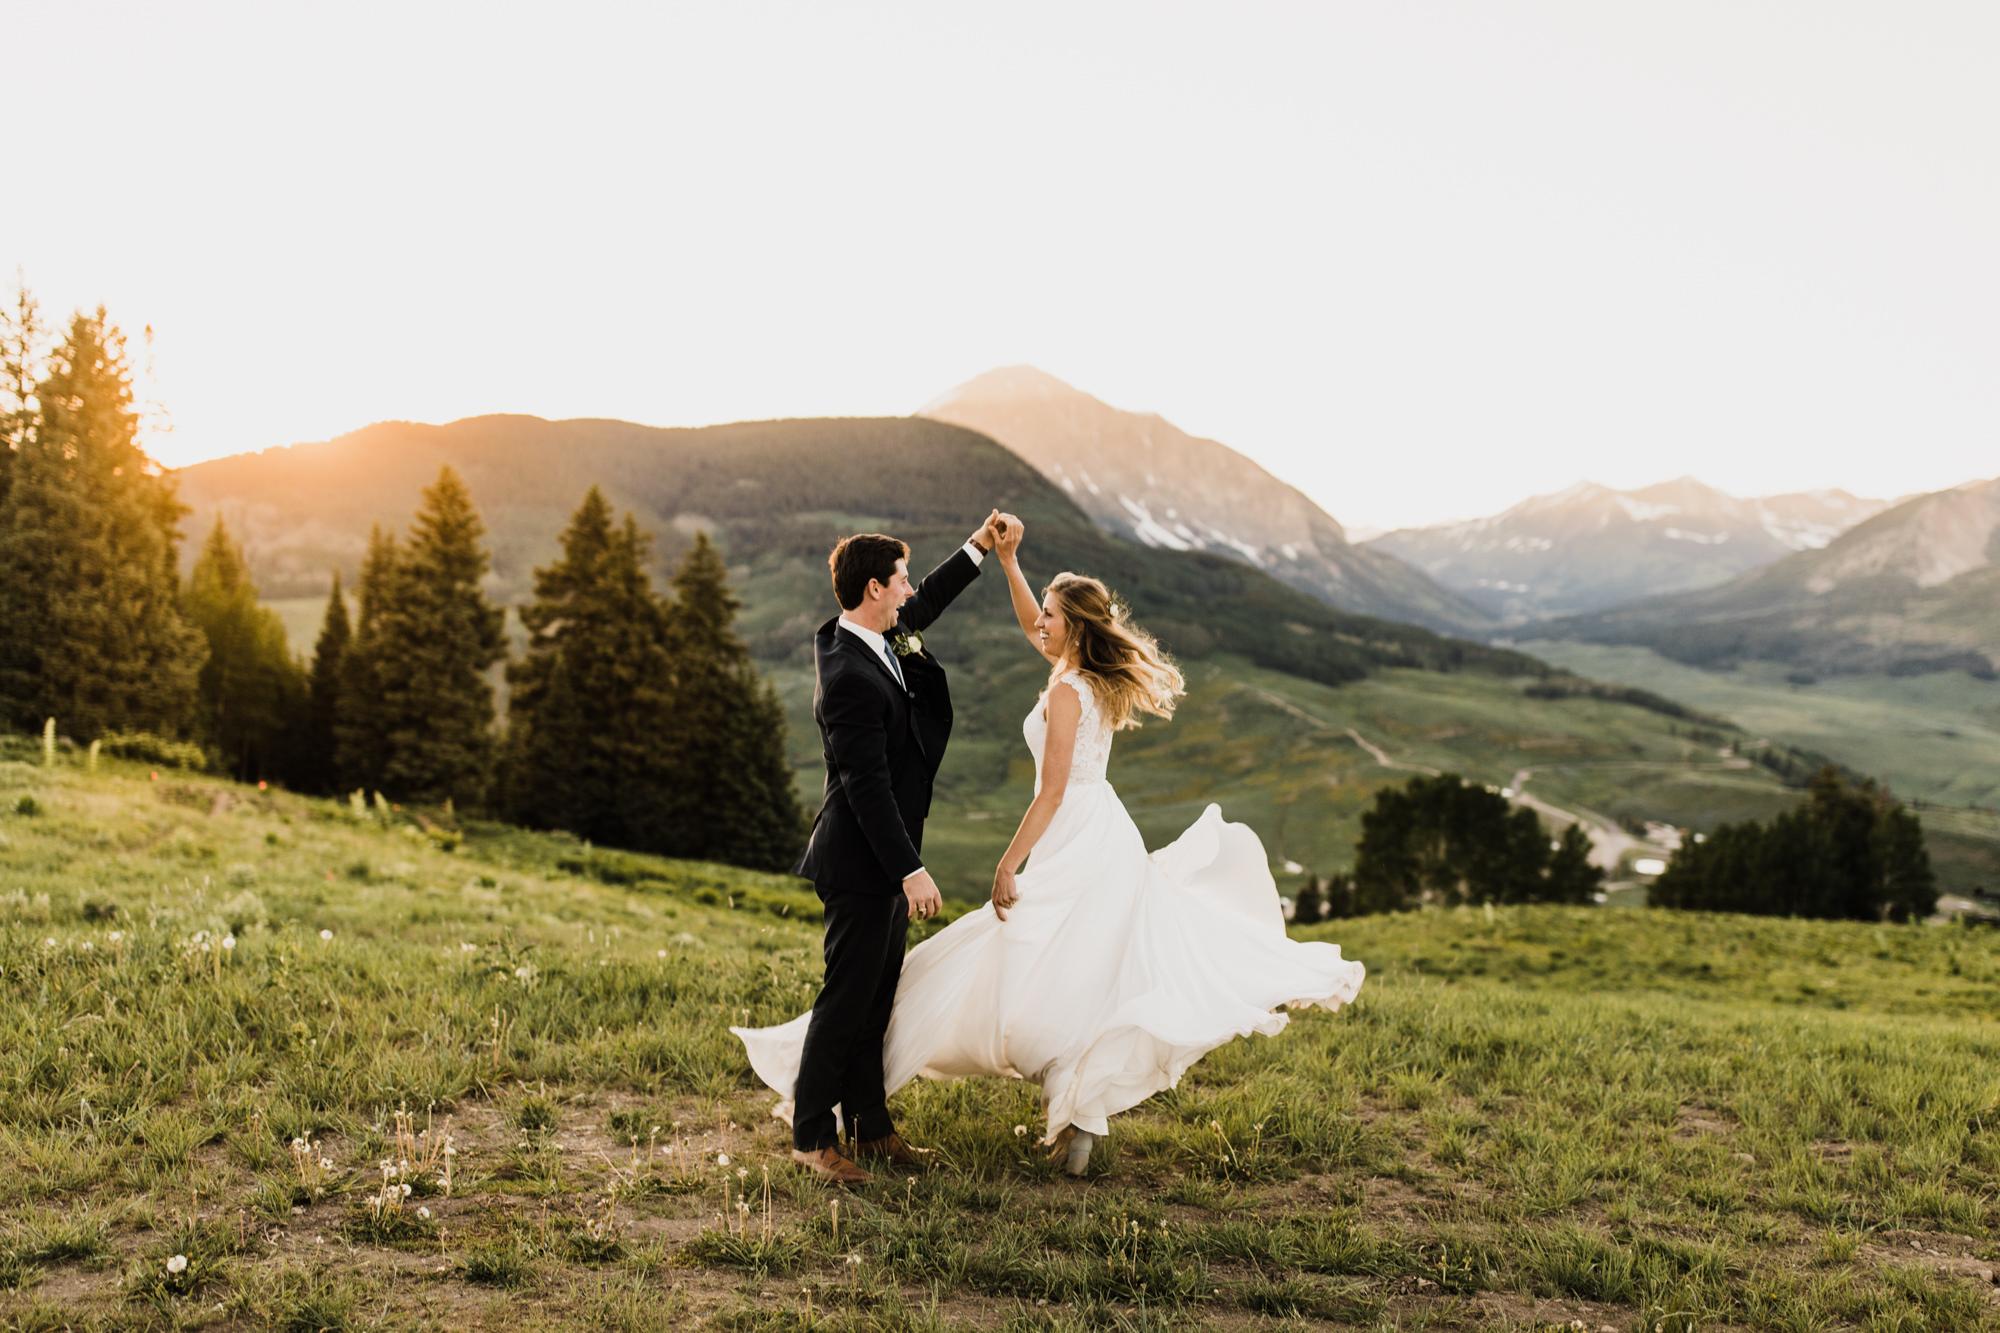 crested butte ski resort intimate wedding | destination adventure wedding photographers | the hearnes adventure photography | www.thehearnes.com